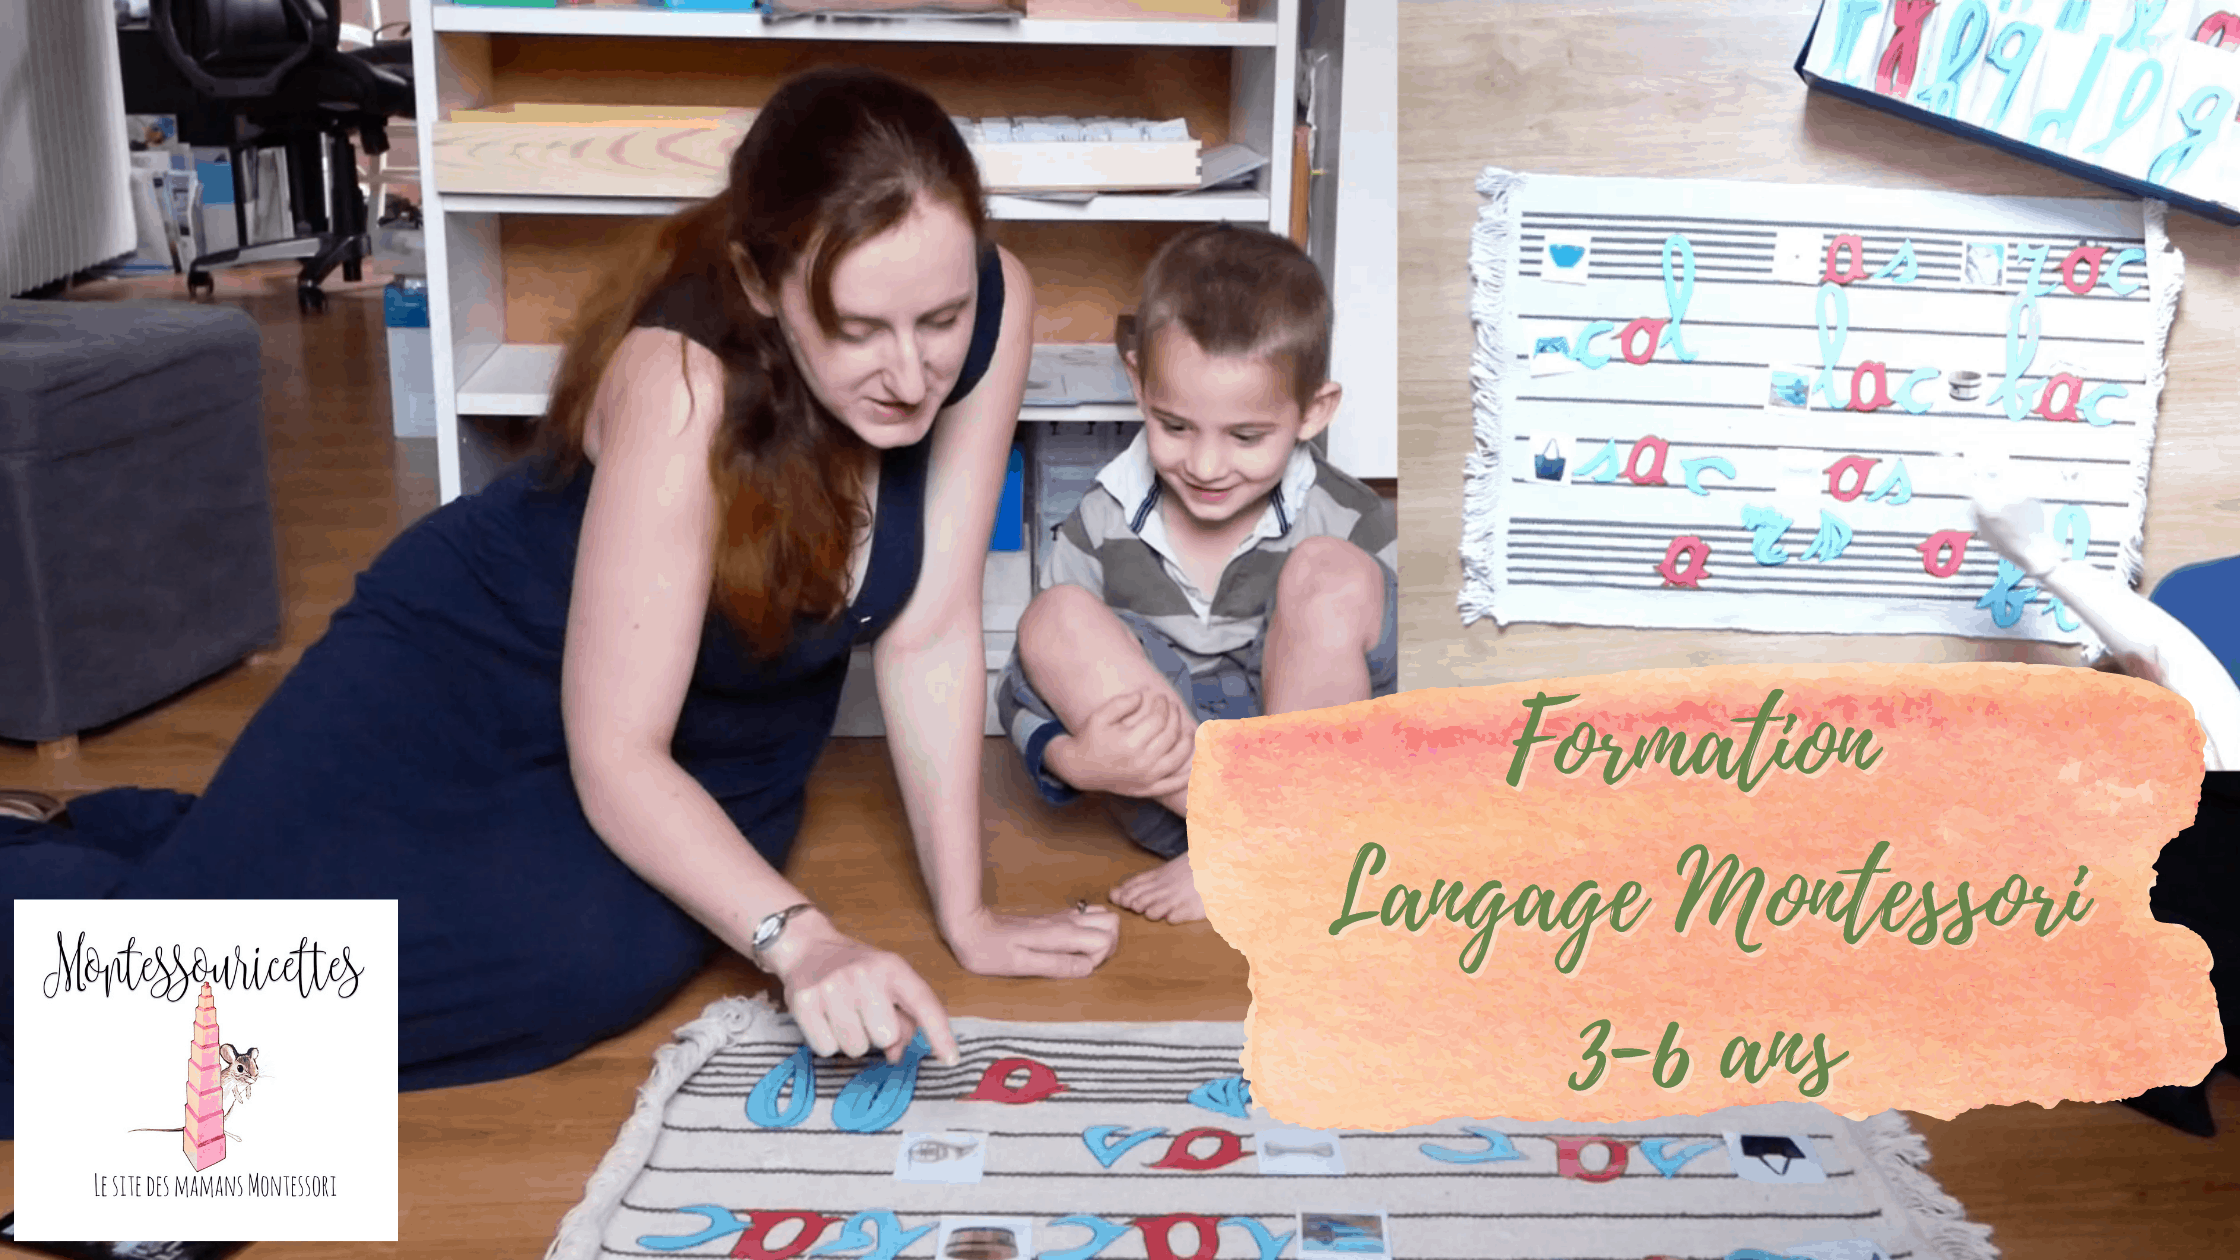 Formation langage Montessori 3-6 ans